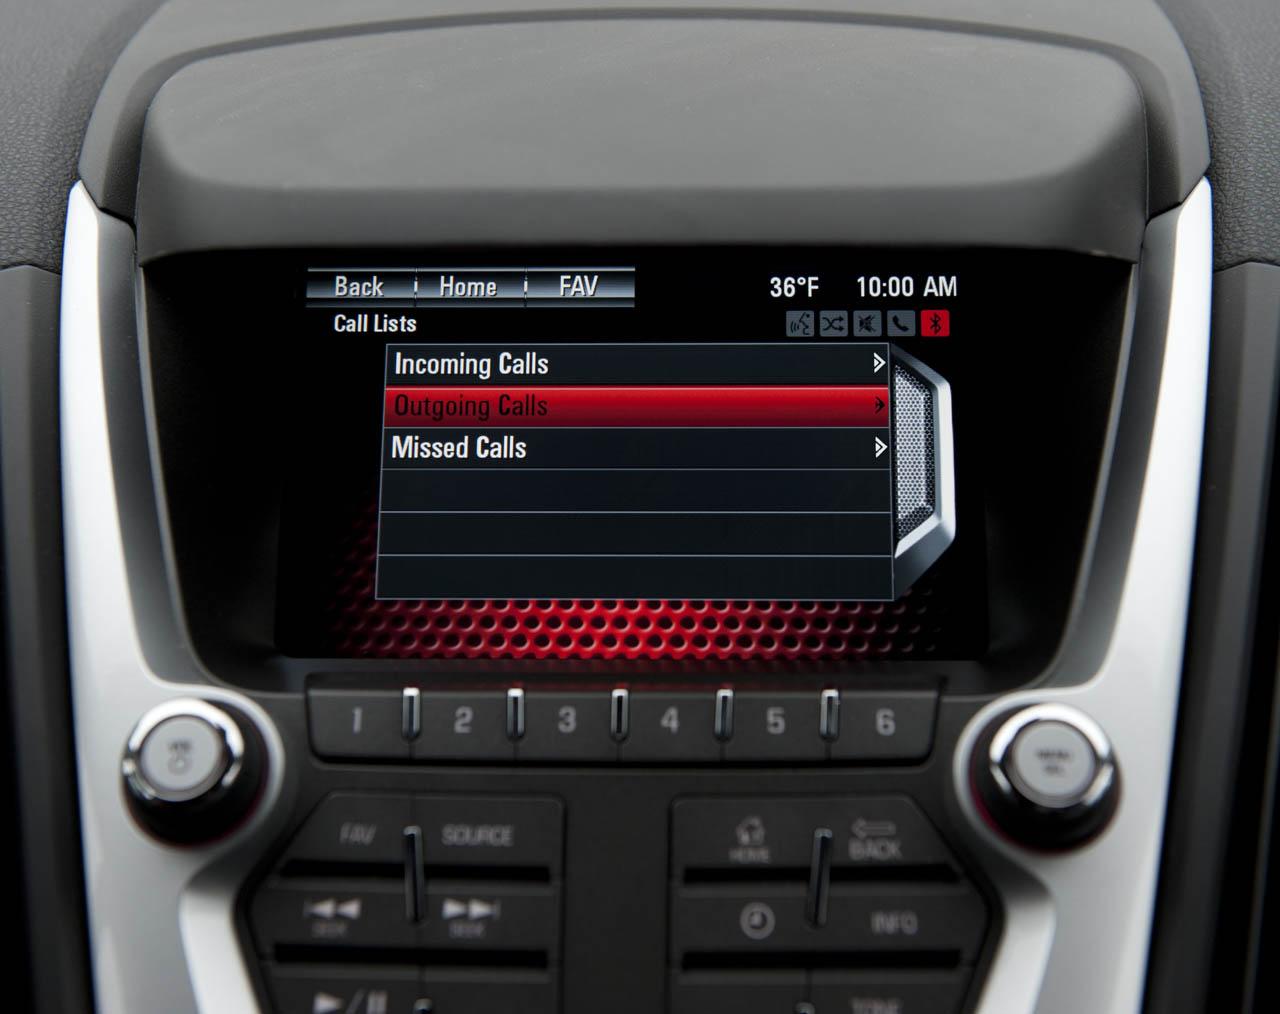 2012 gmc terrain radio software update